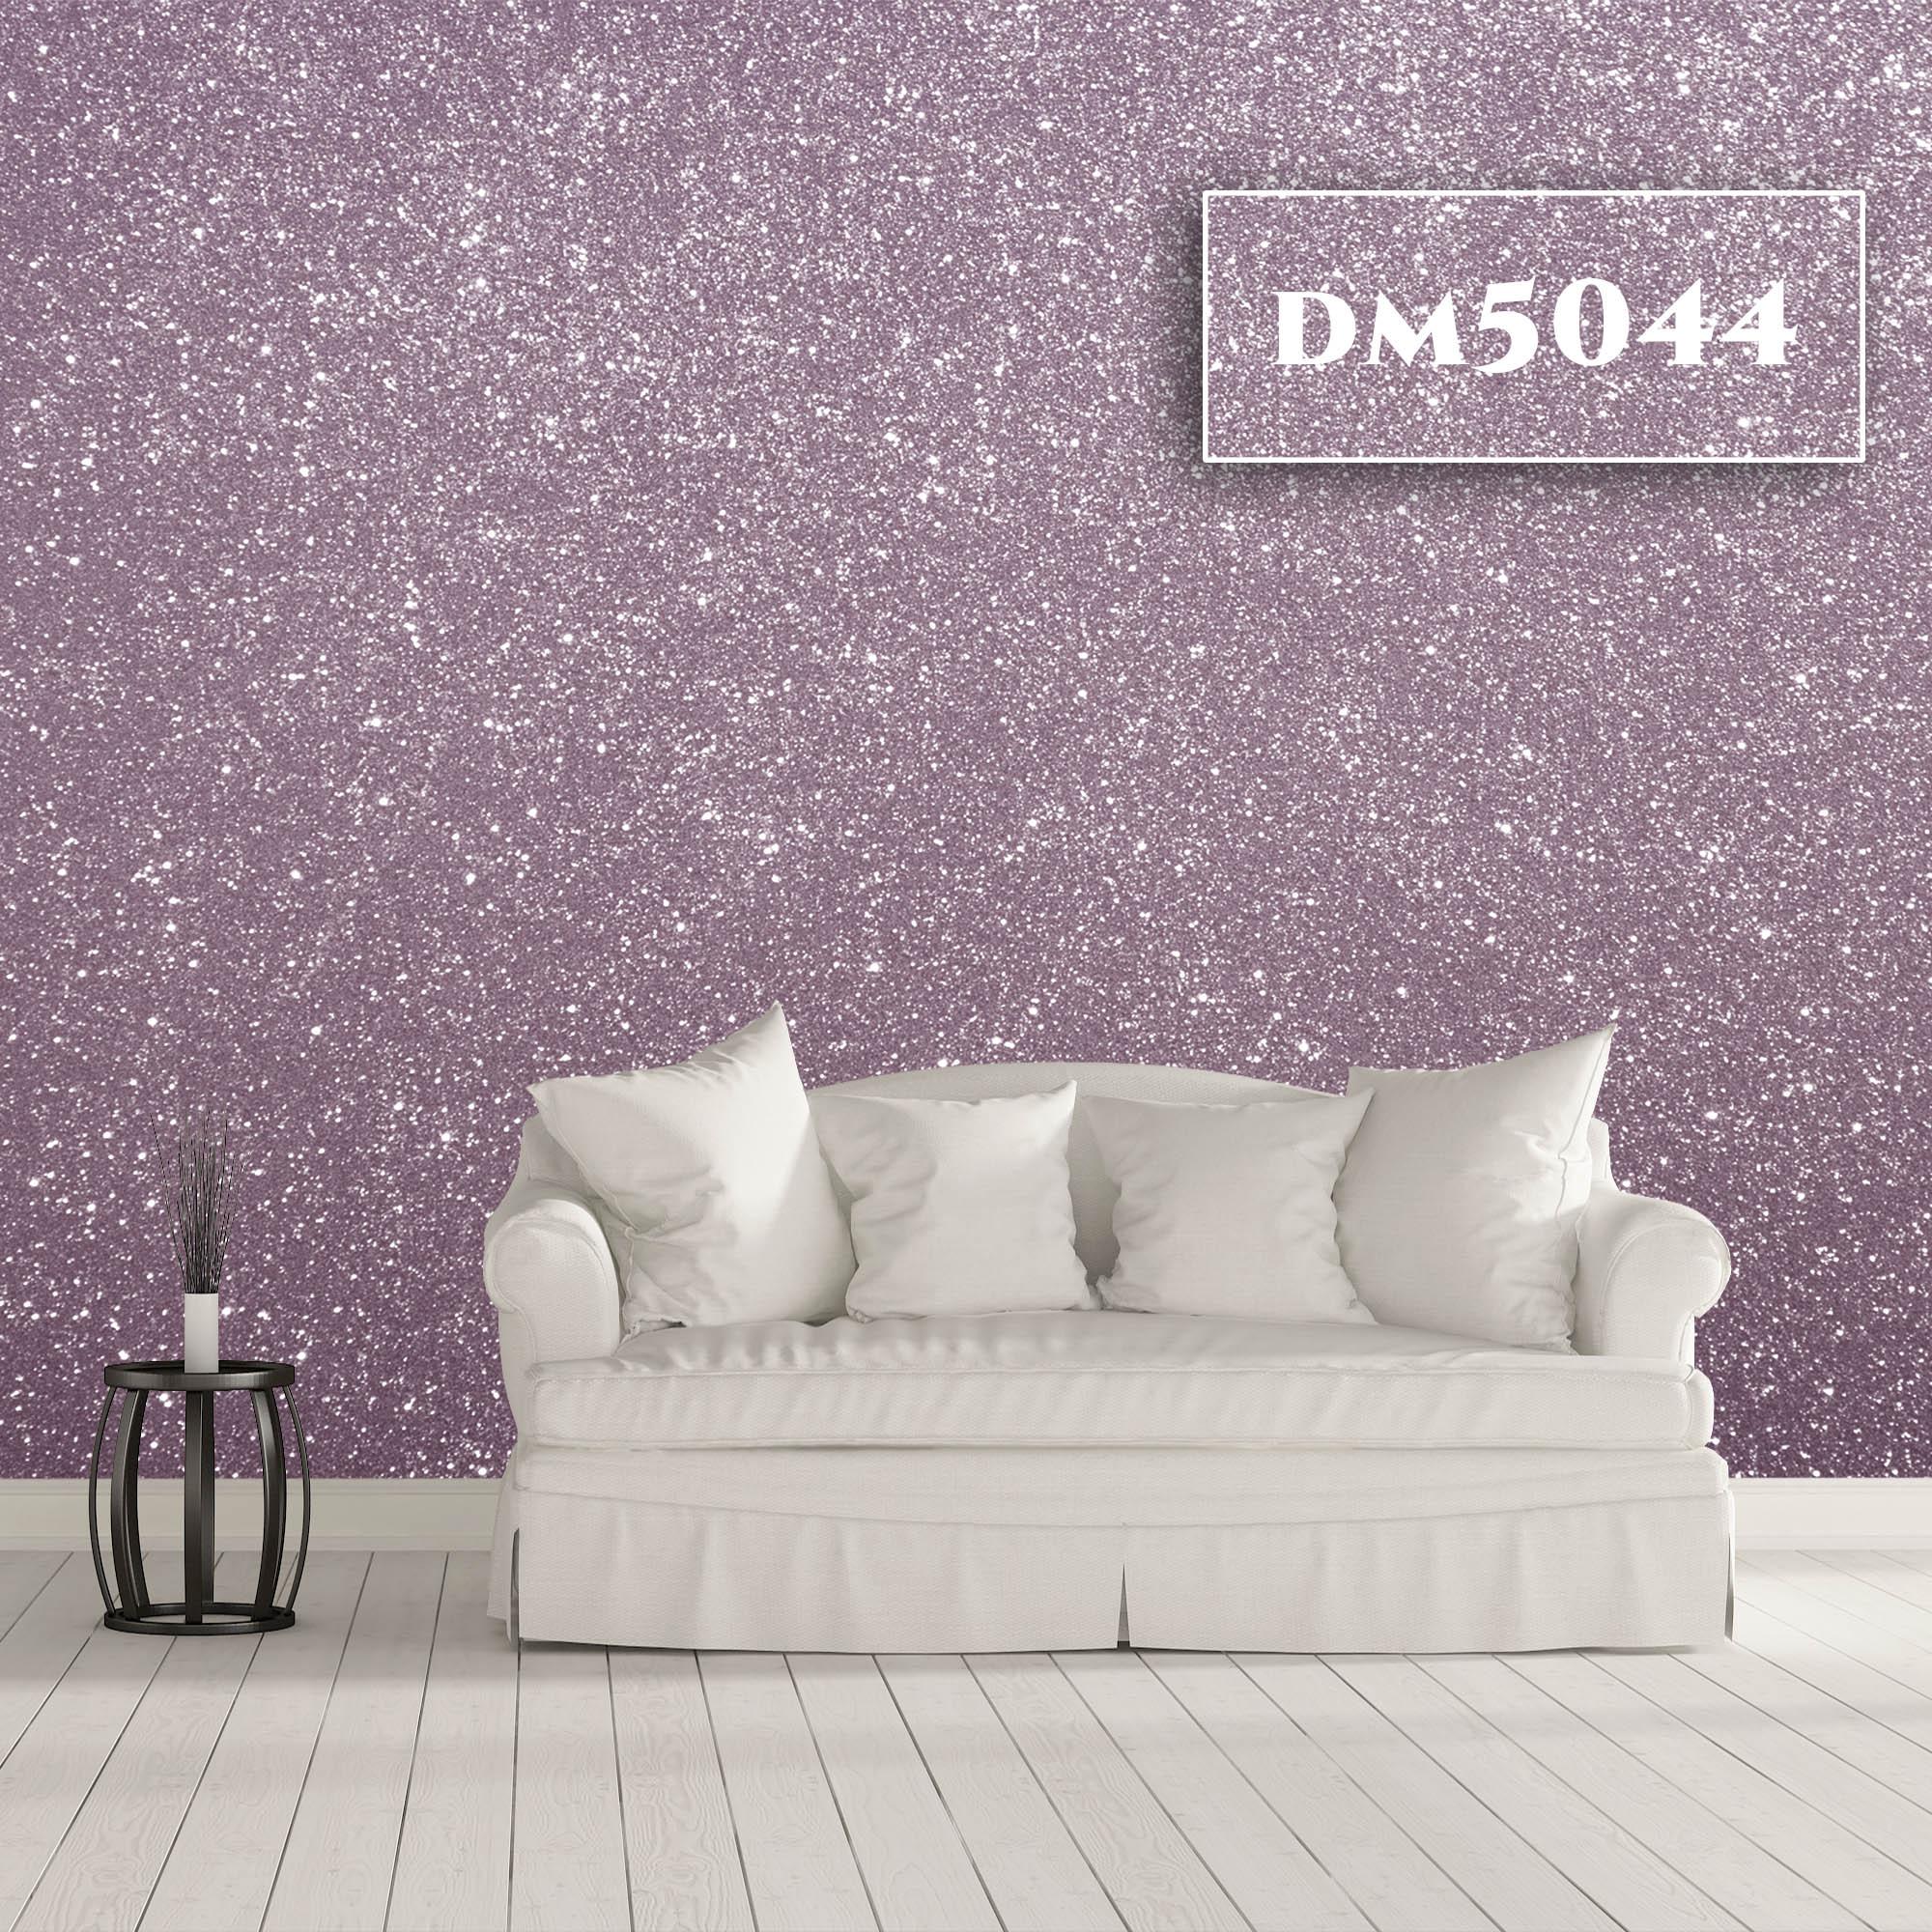 DM5044